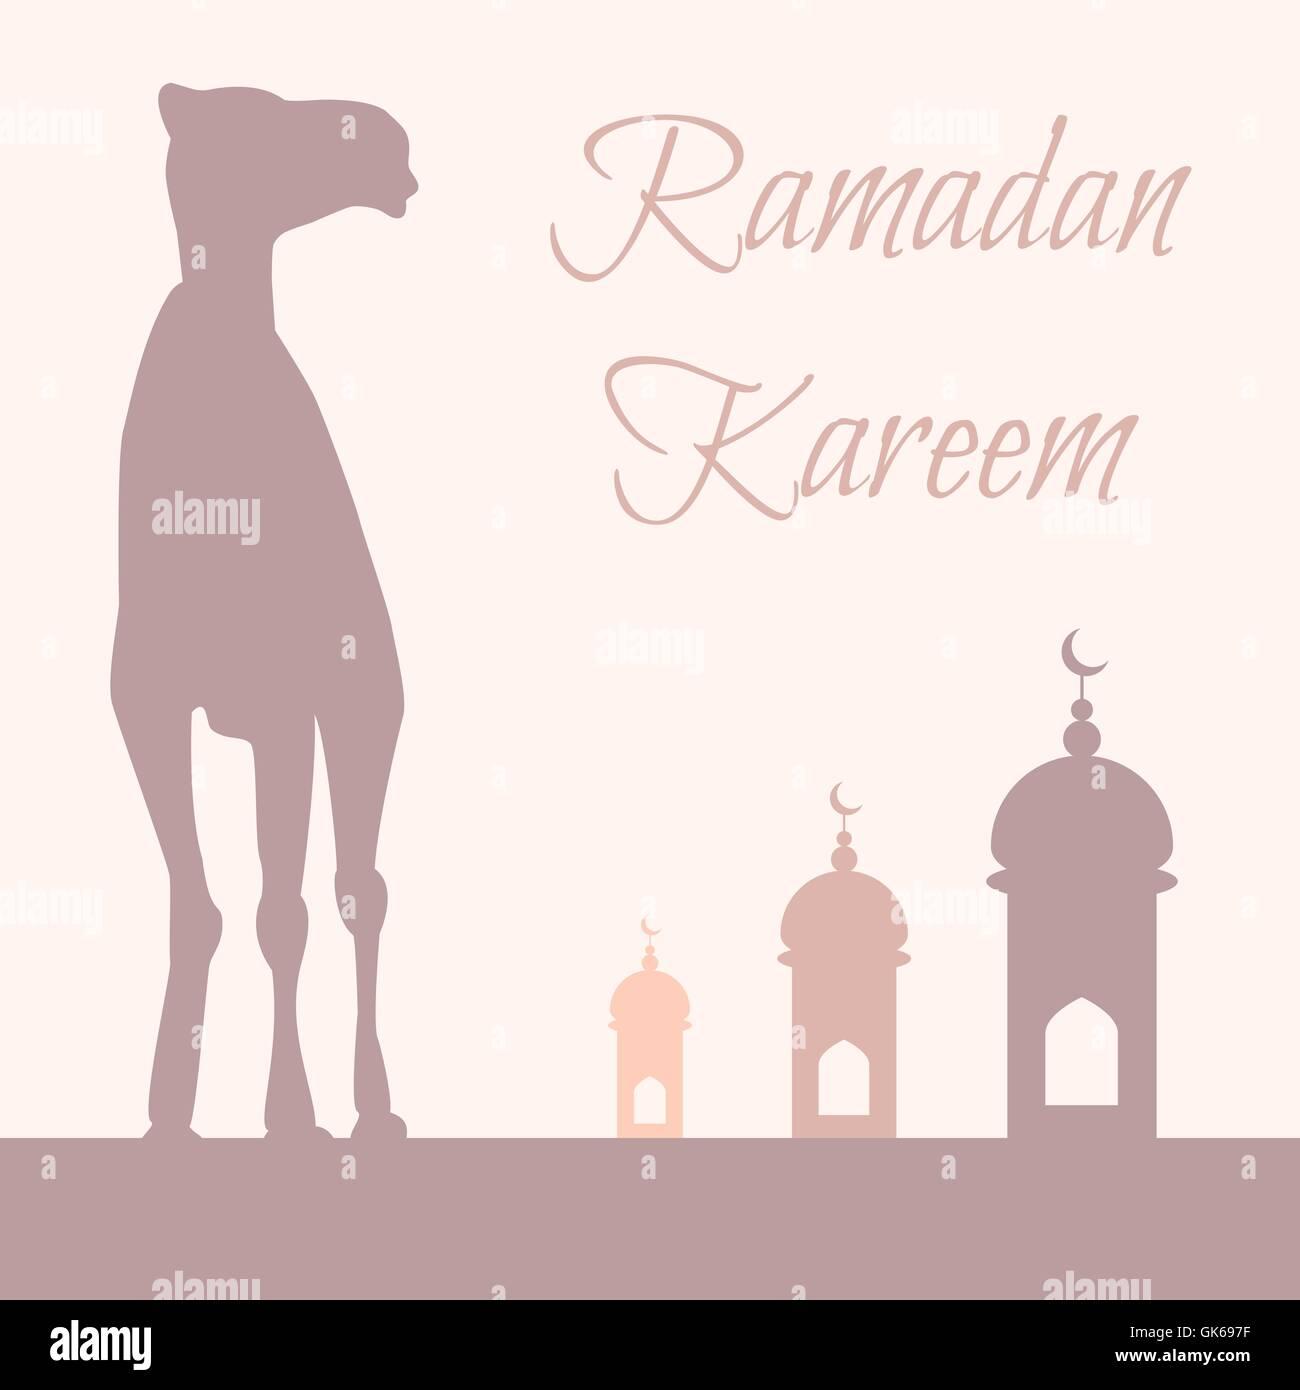 Ramadan greeting with camel islamic greeting card for ramadan stock ramadan greeting with camel islamic greeting card for ramadan kareem vector kristyandbryce Image collections